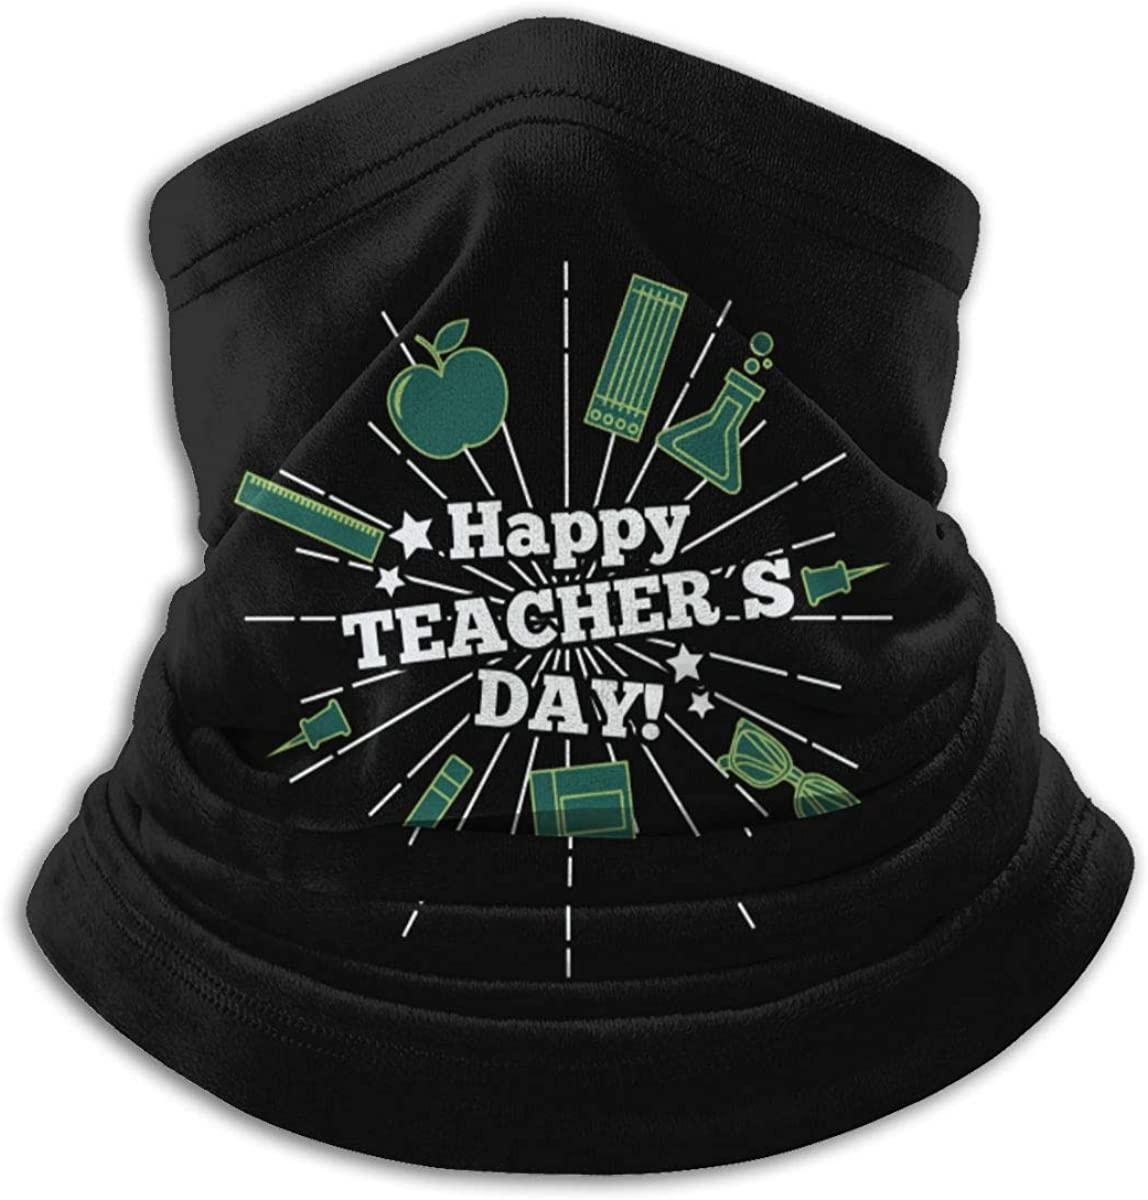 Teachers Day Black Multi-function Neck Warmer Gaiter Polyester Neck Warmer Windproof Winter Neck Gaiter Cold Weather Scarf For Men Women